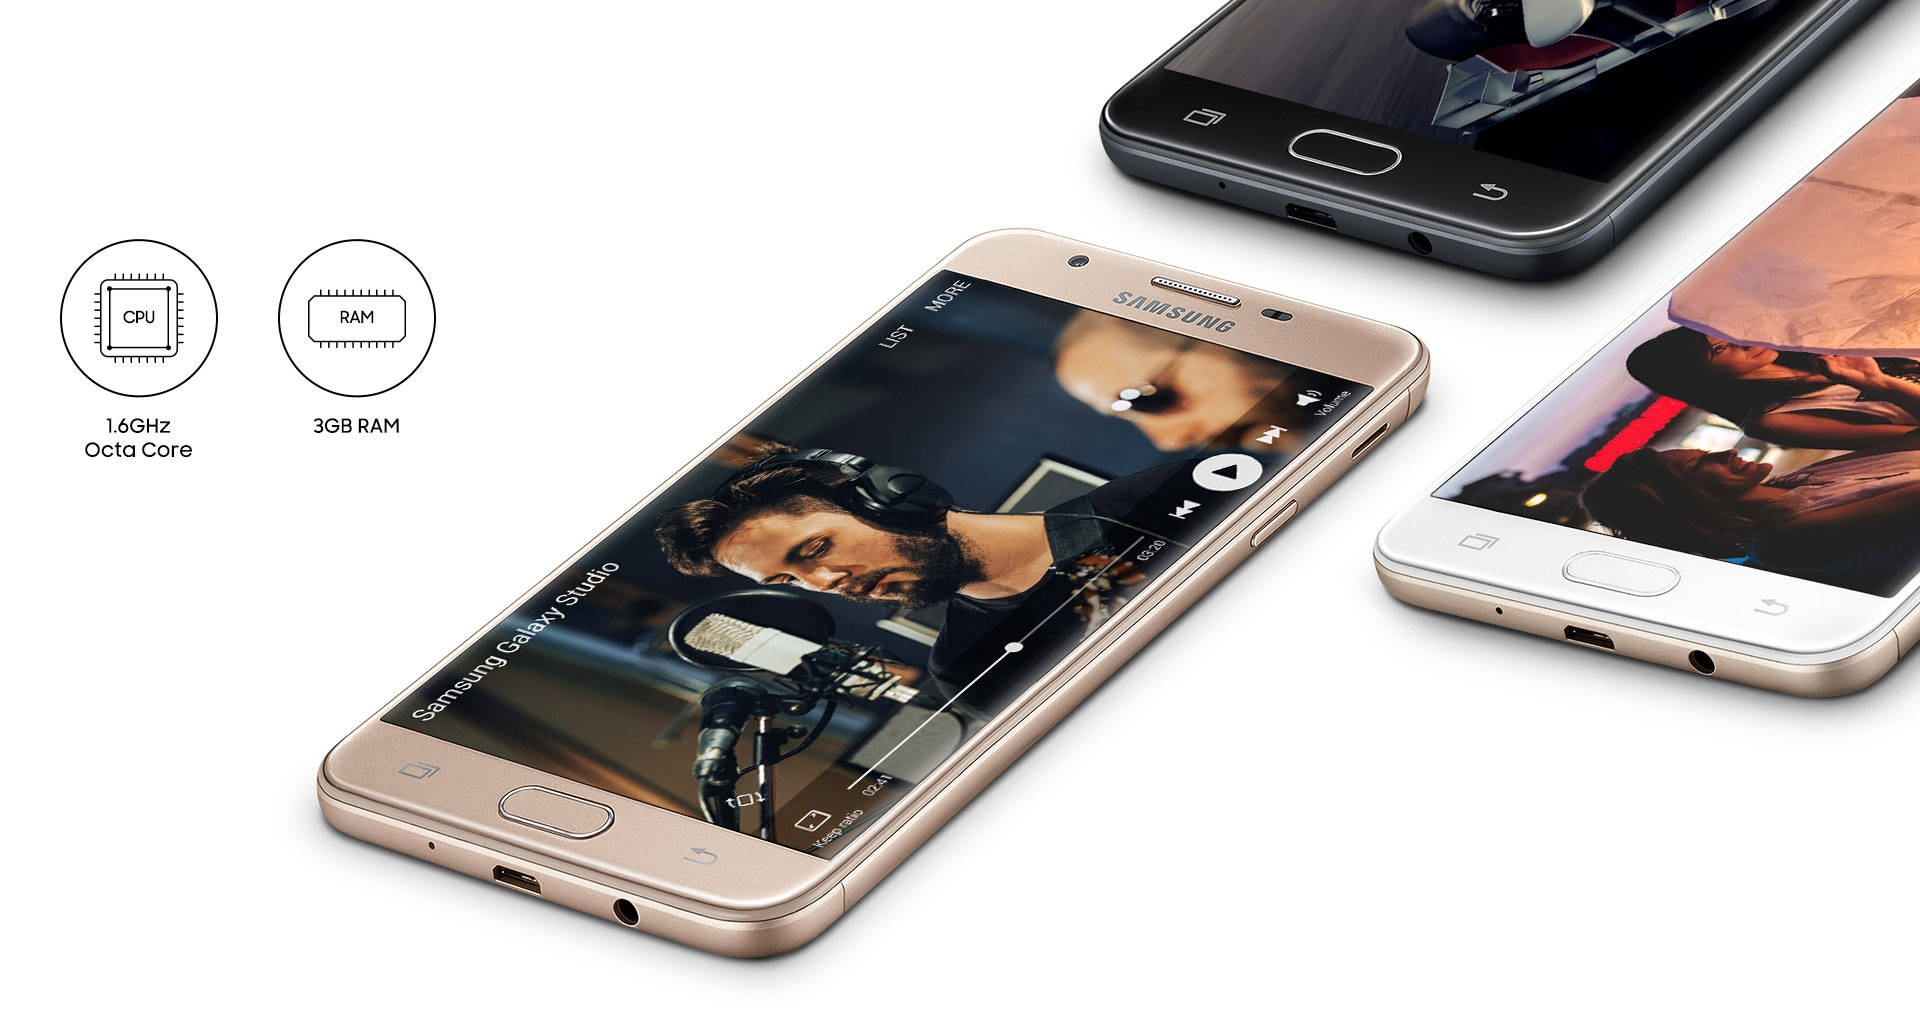 Samsung galaxy j7 prime with fast processor